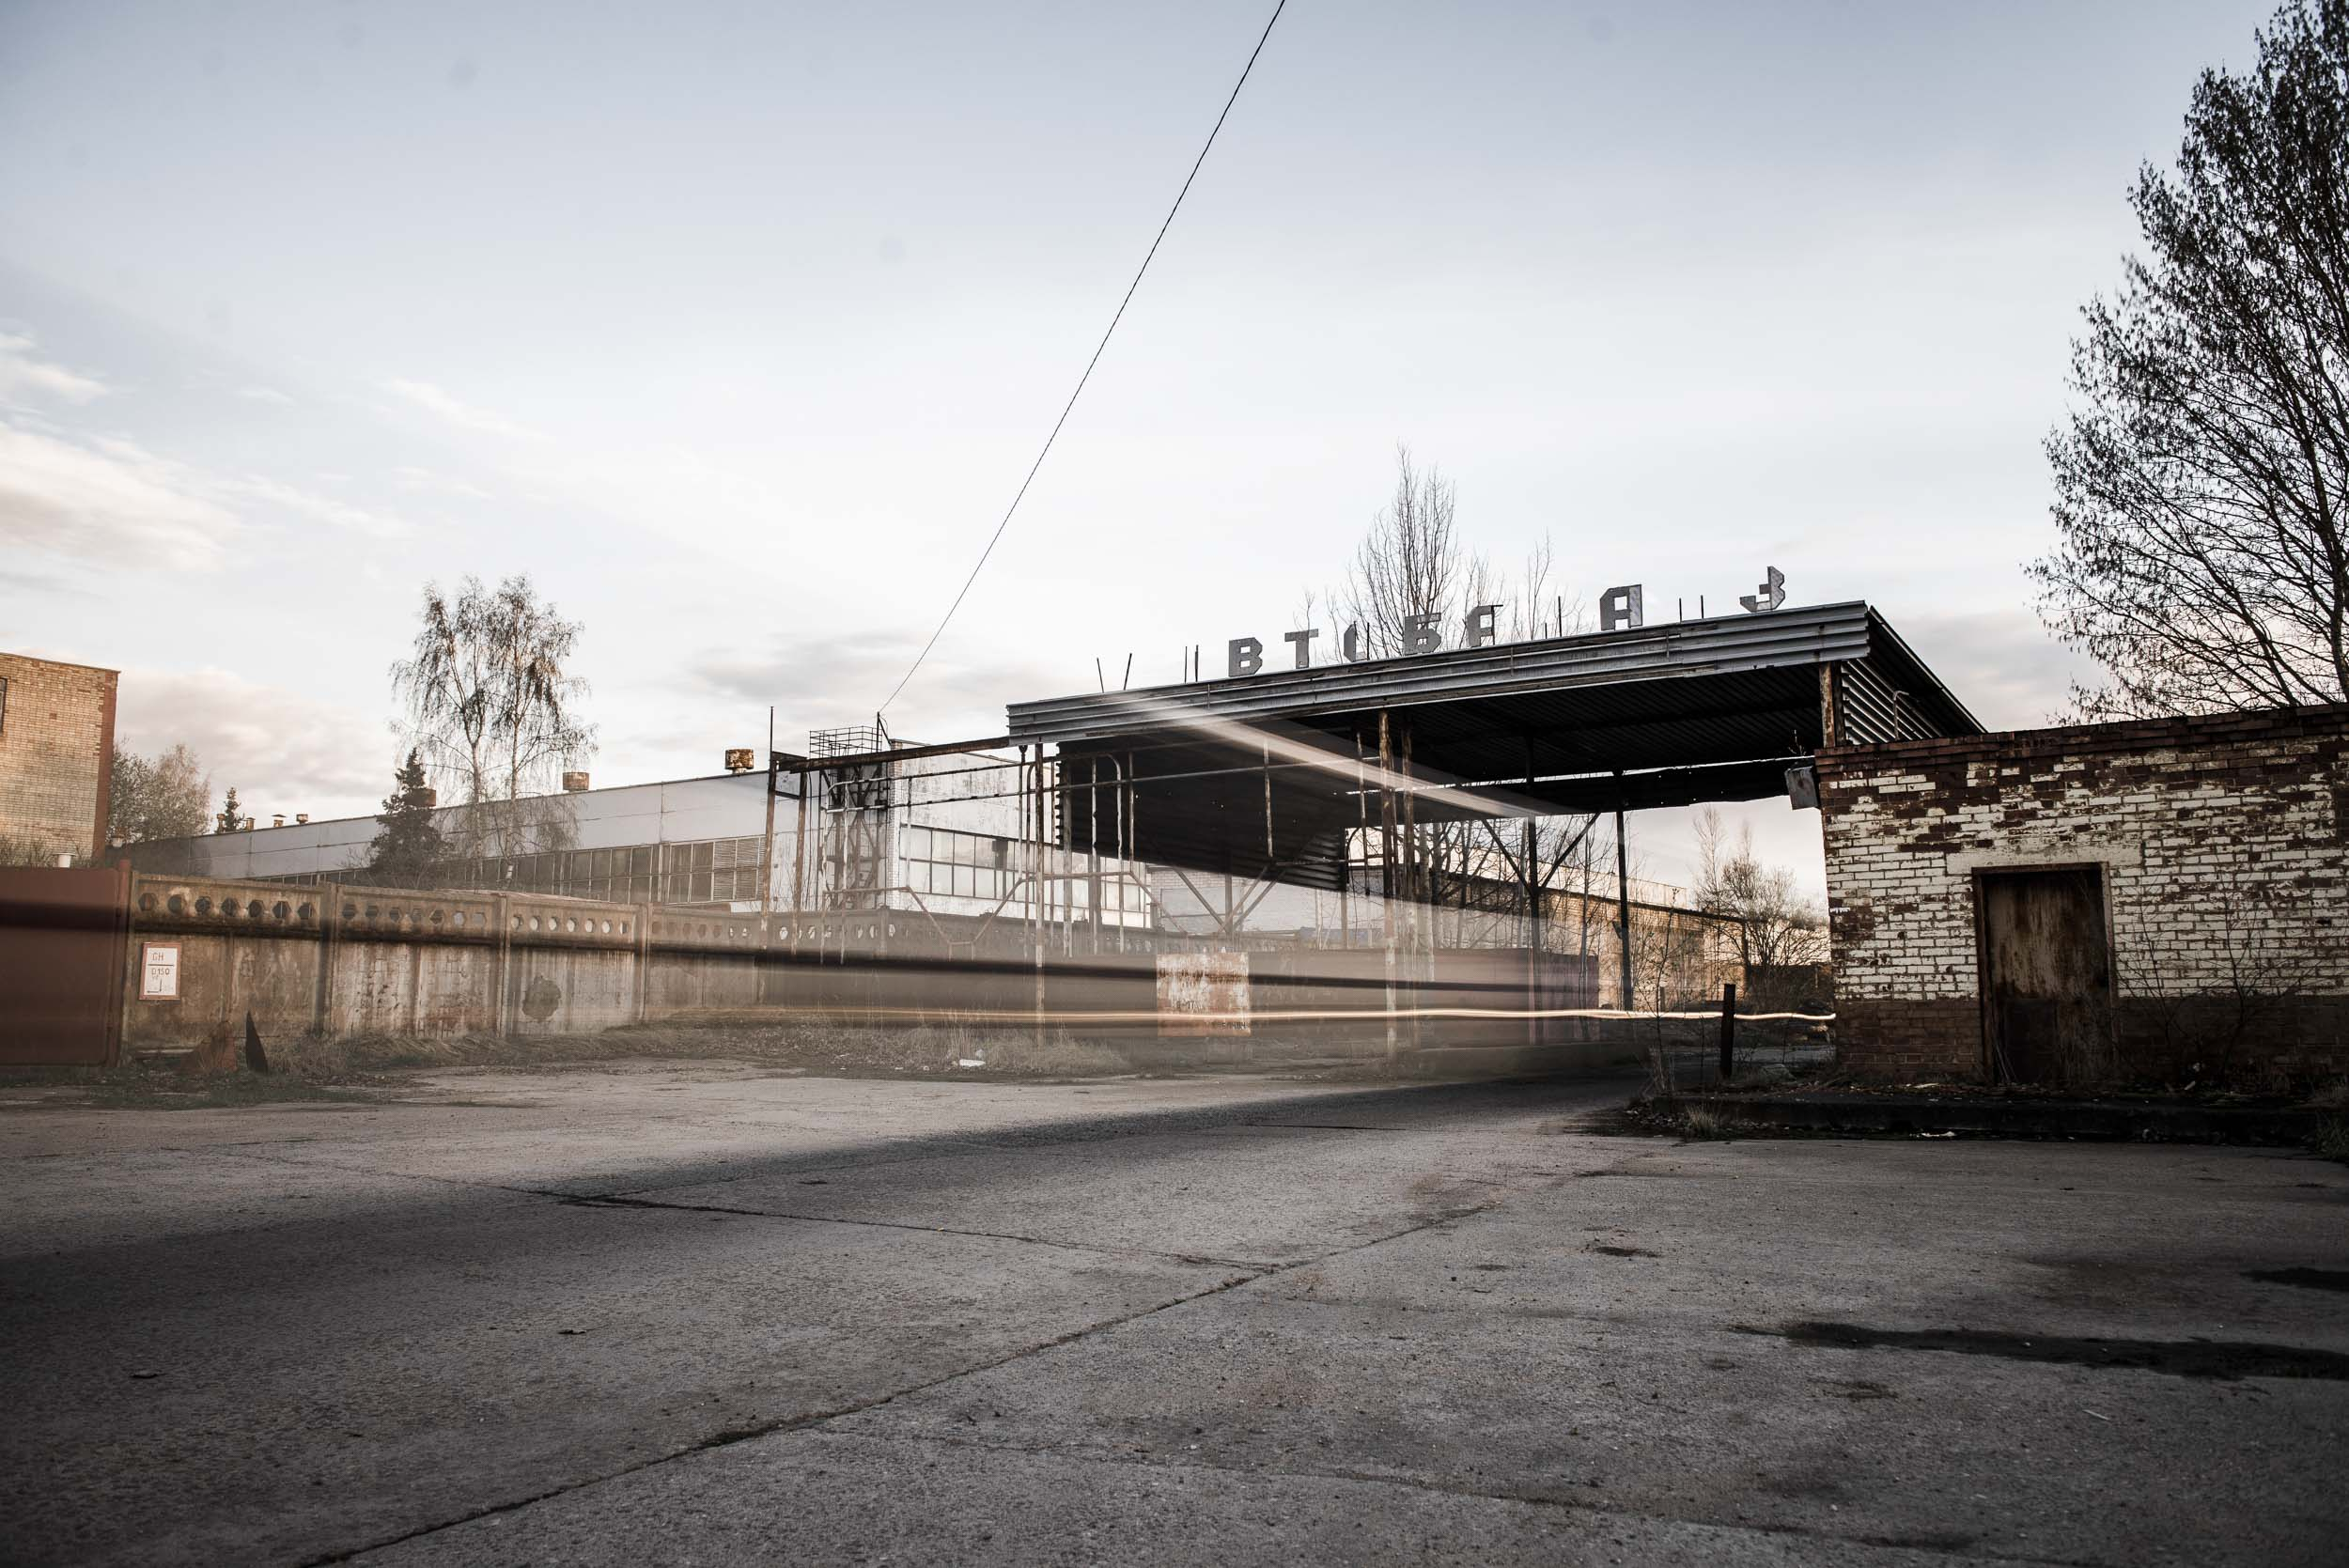 Ruins_of_soviet_union_©Ignas_Vincerzevskis-5.jpg